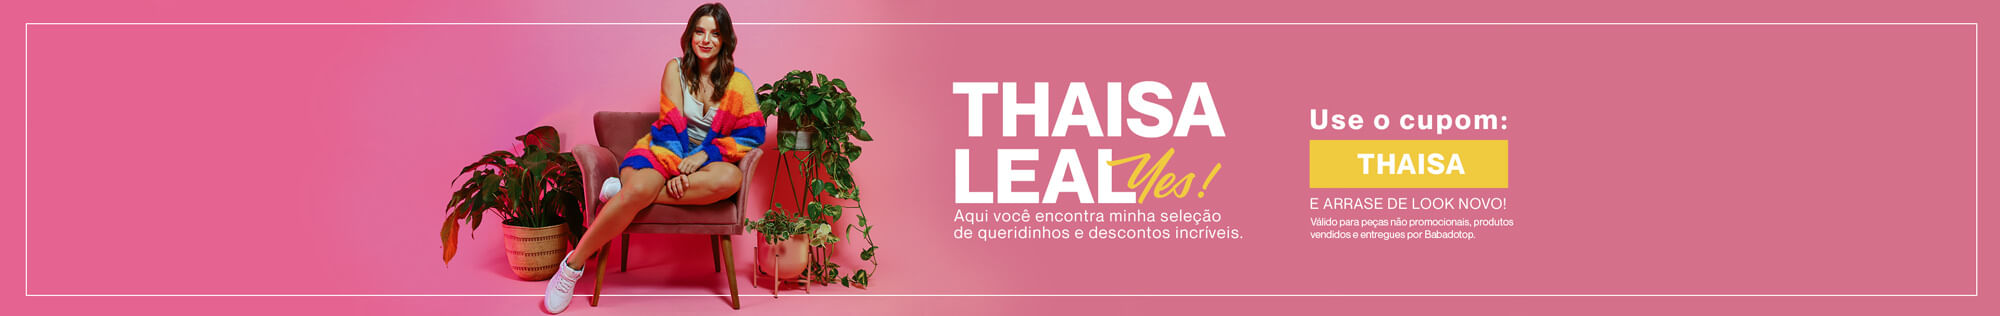 Use o cupom Thaisa Leal